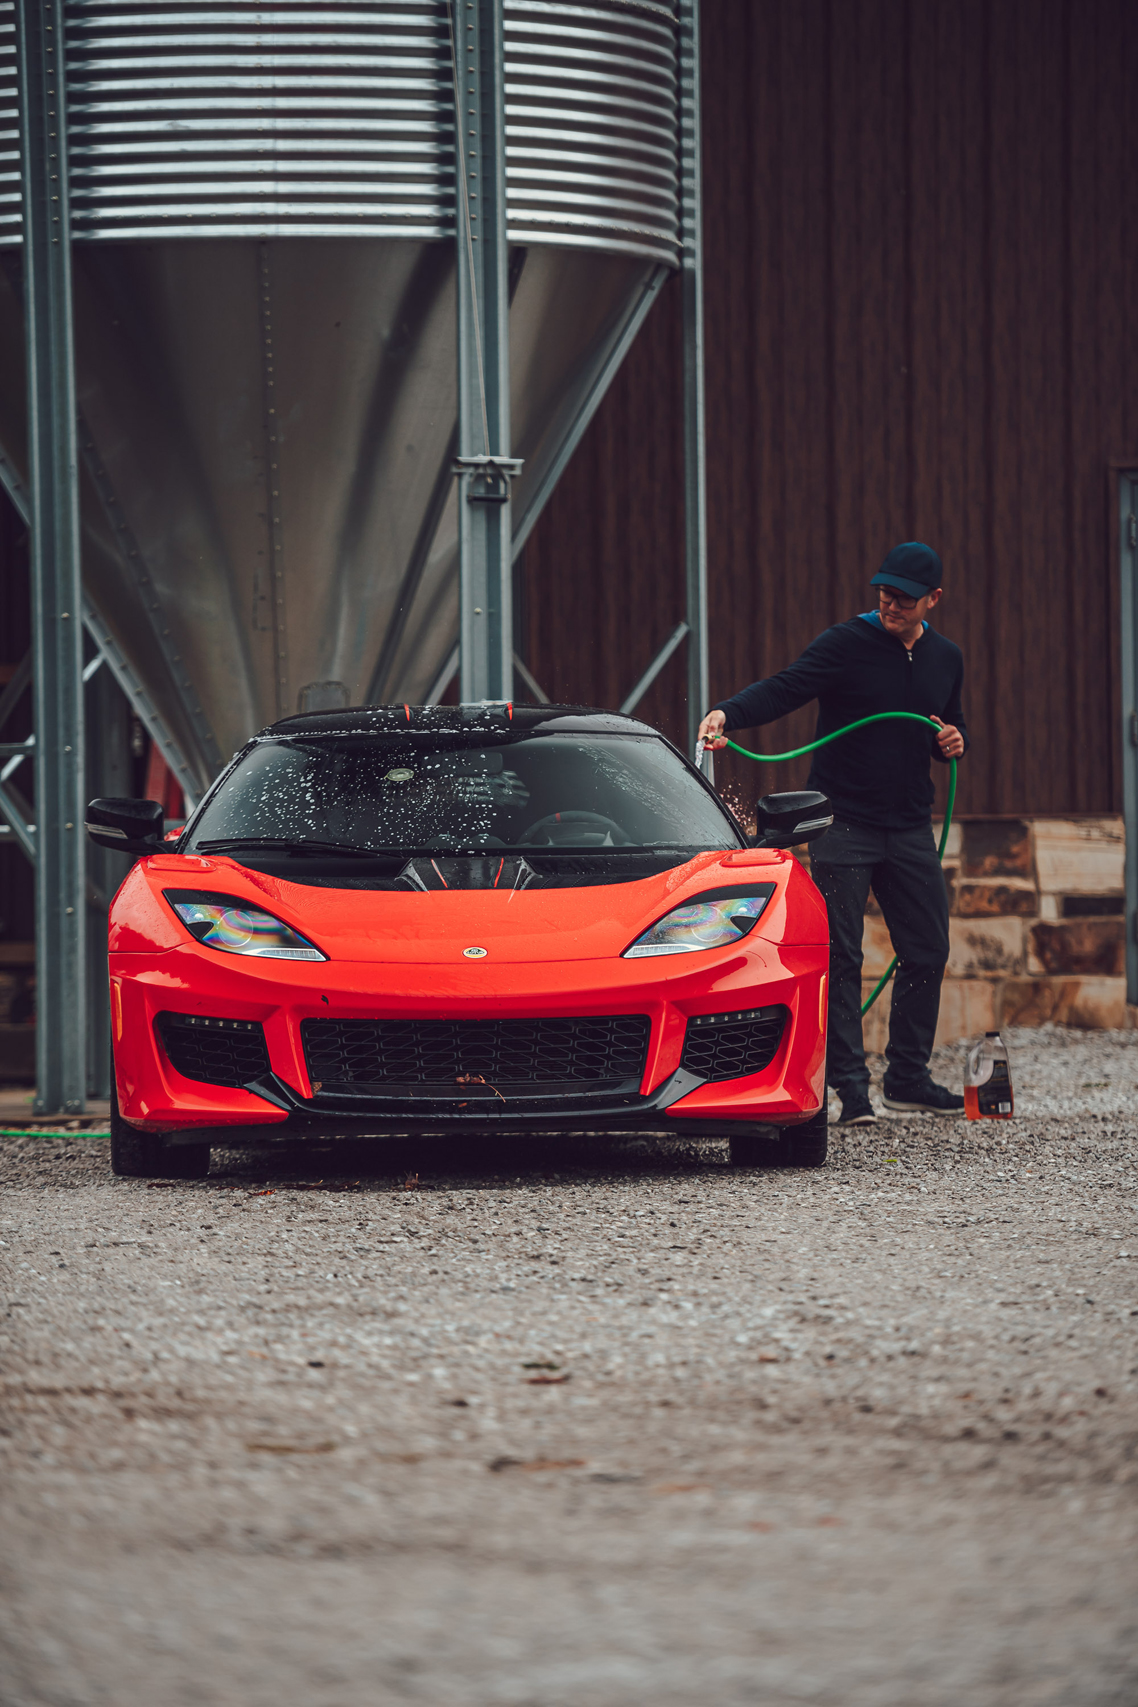 2020 Lotus Evora GT and McKeel Hagerty